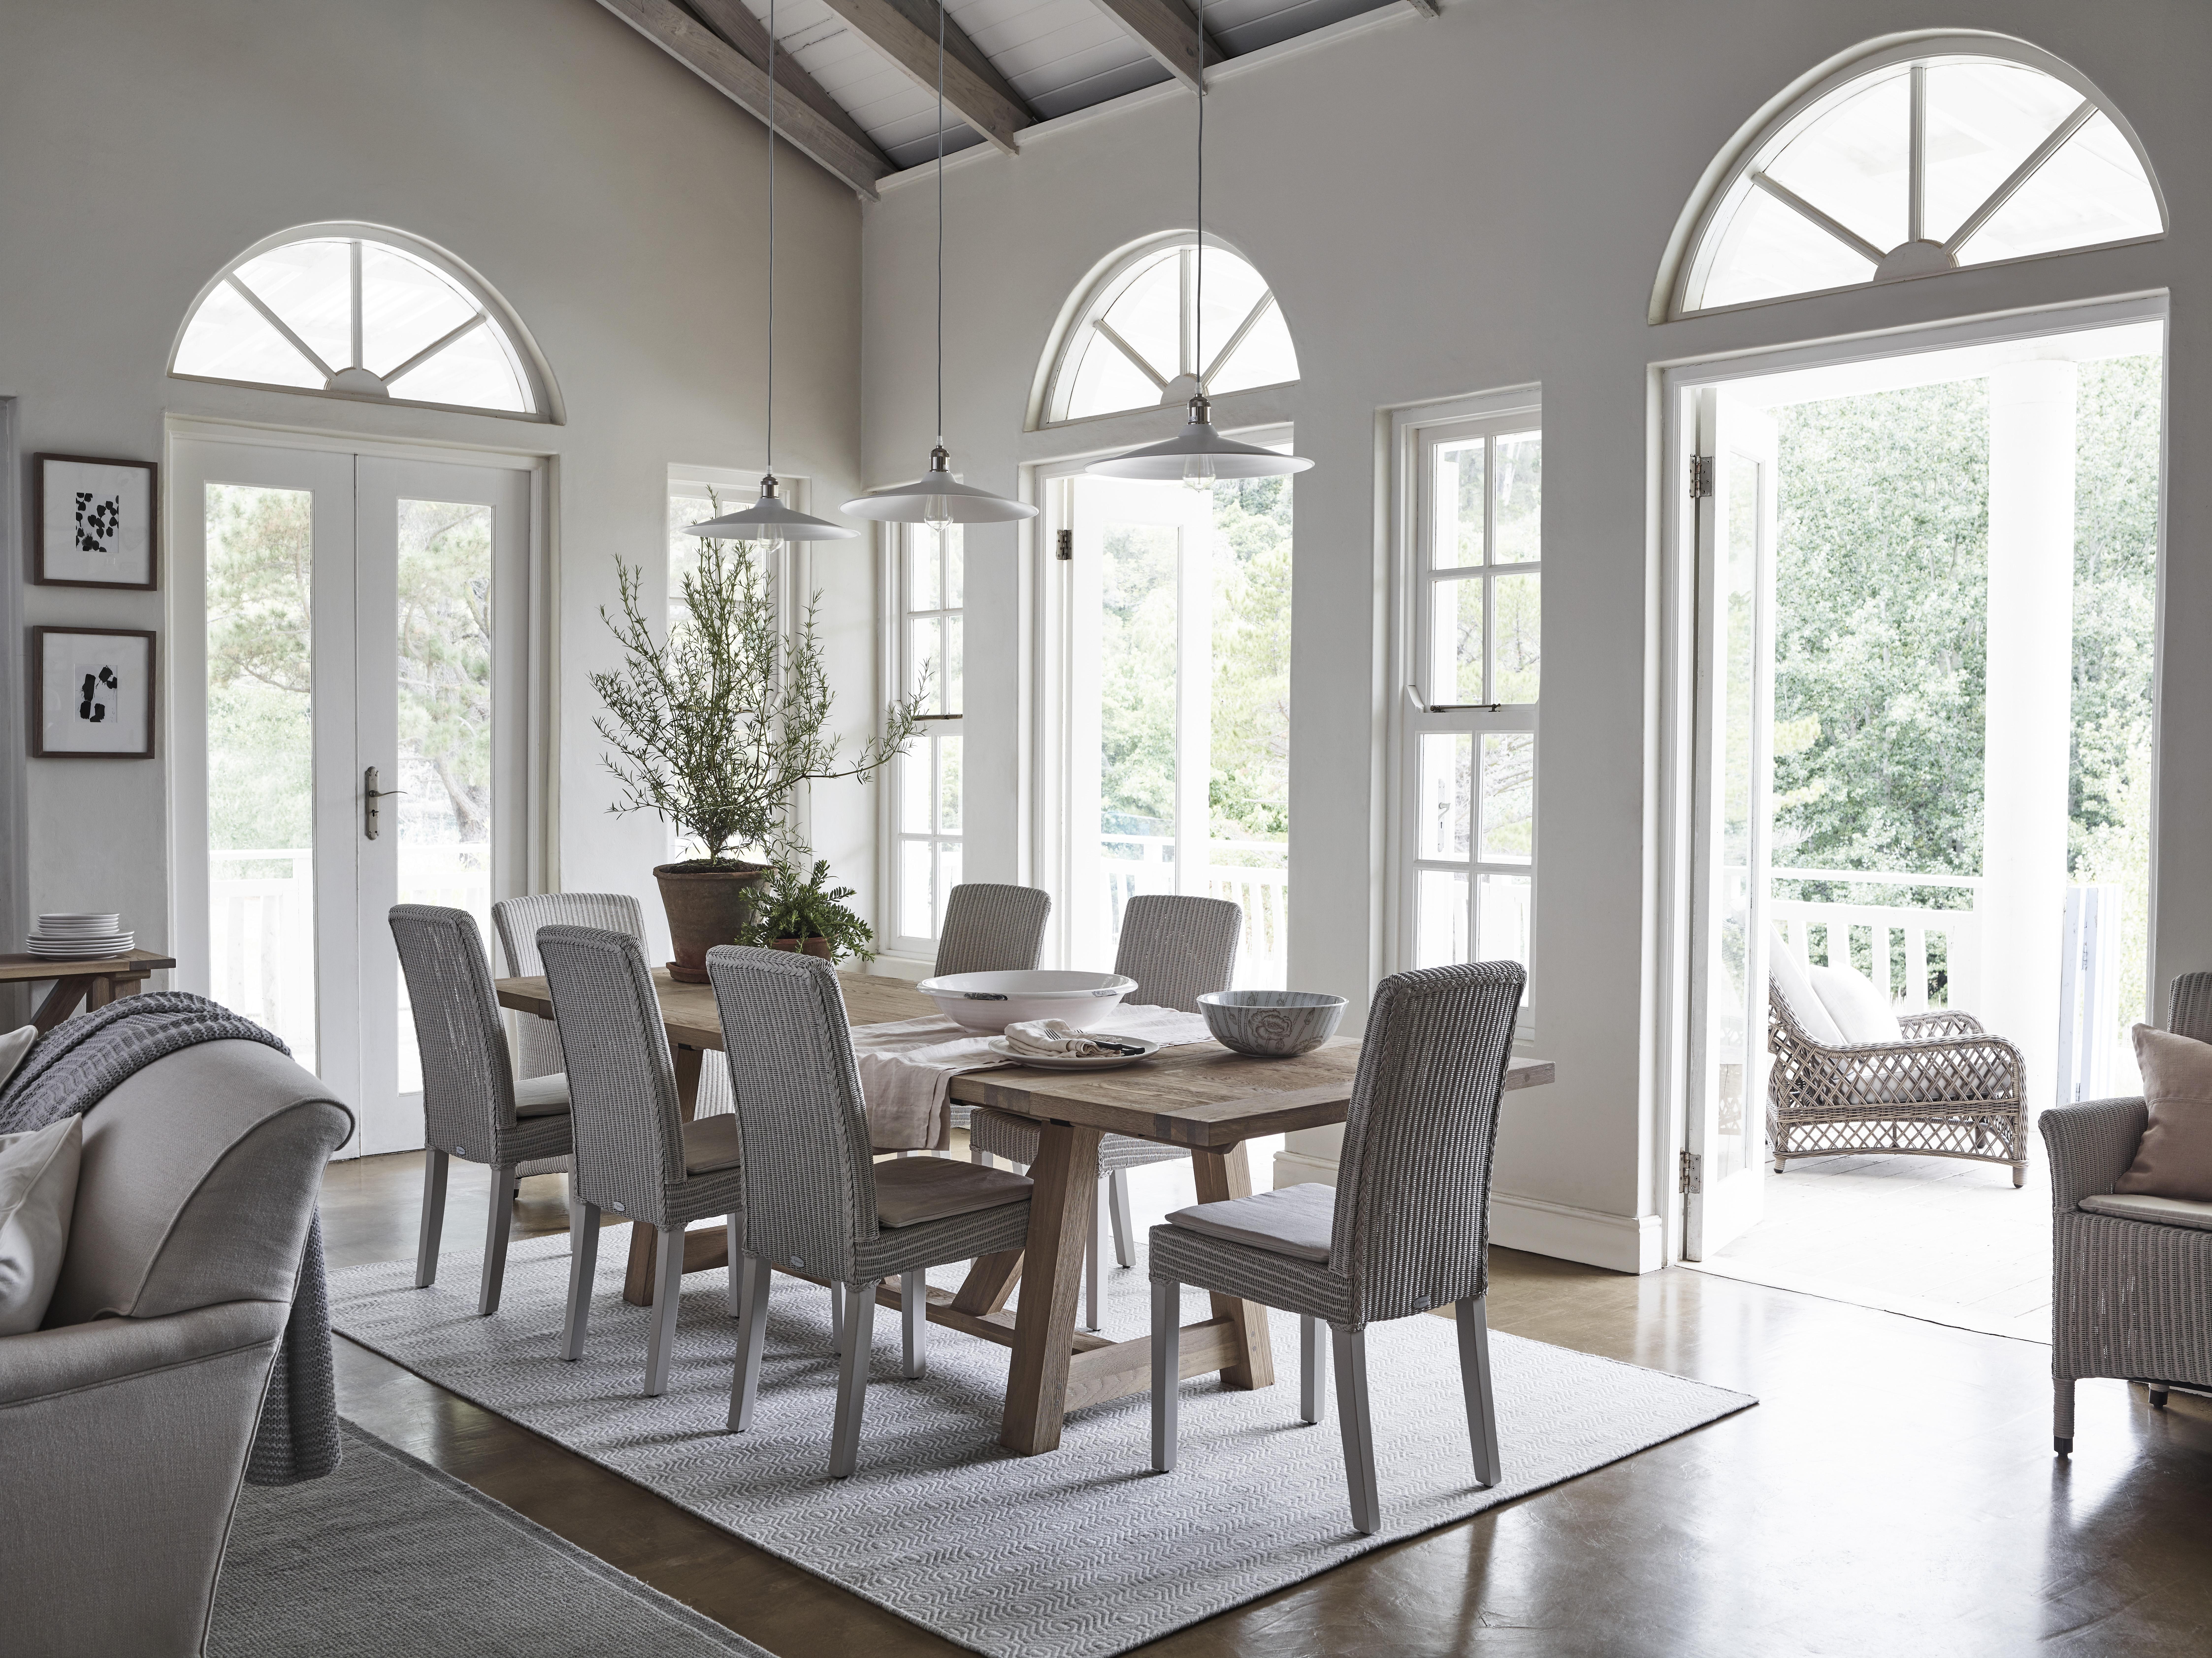 Neptune Arundel Oak Dining Table Dining Room Furniture